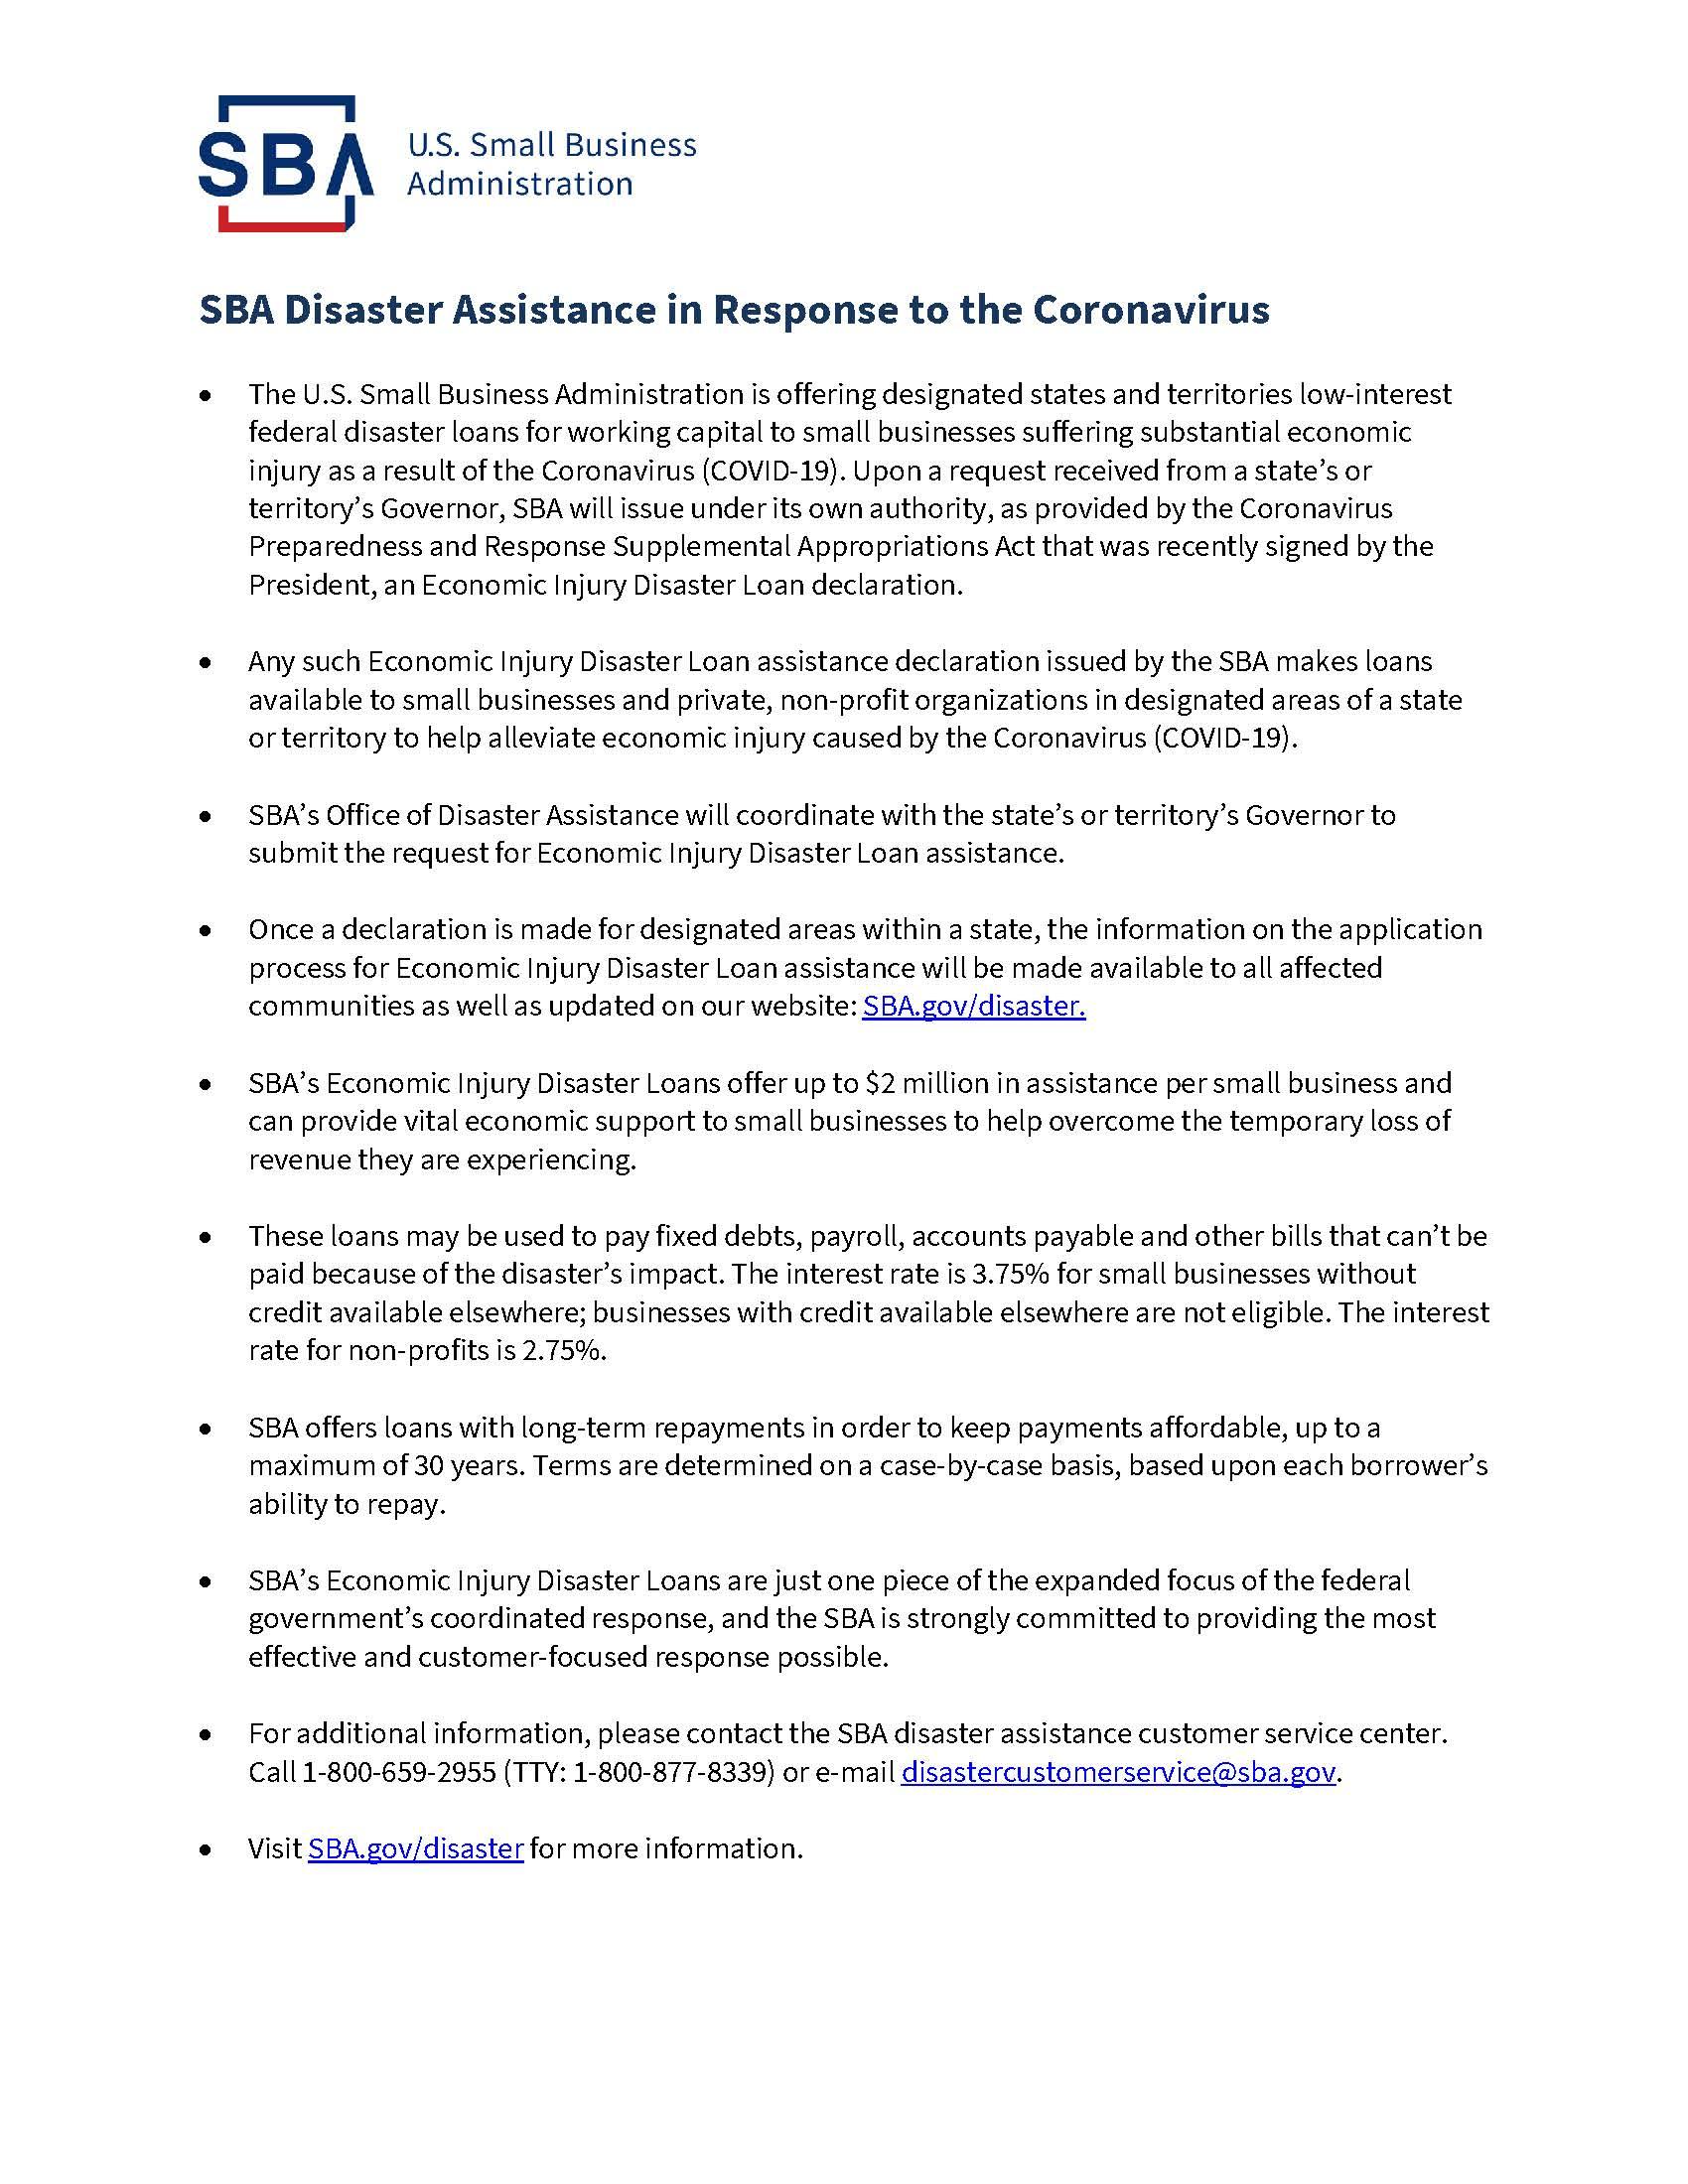 SBA Disaster Assistance Flyer